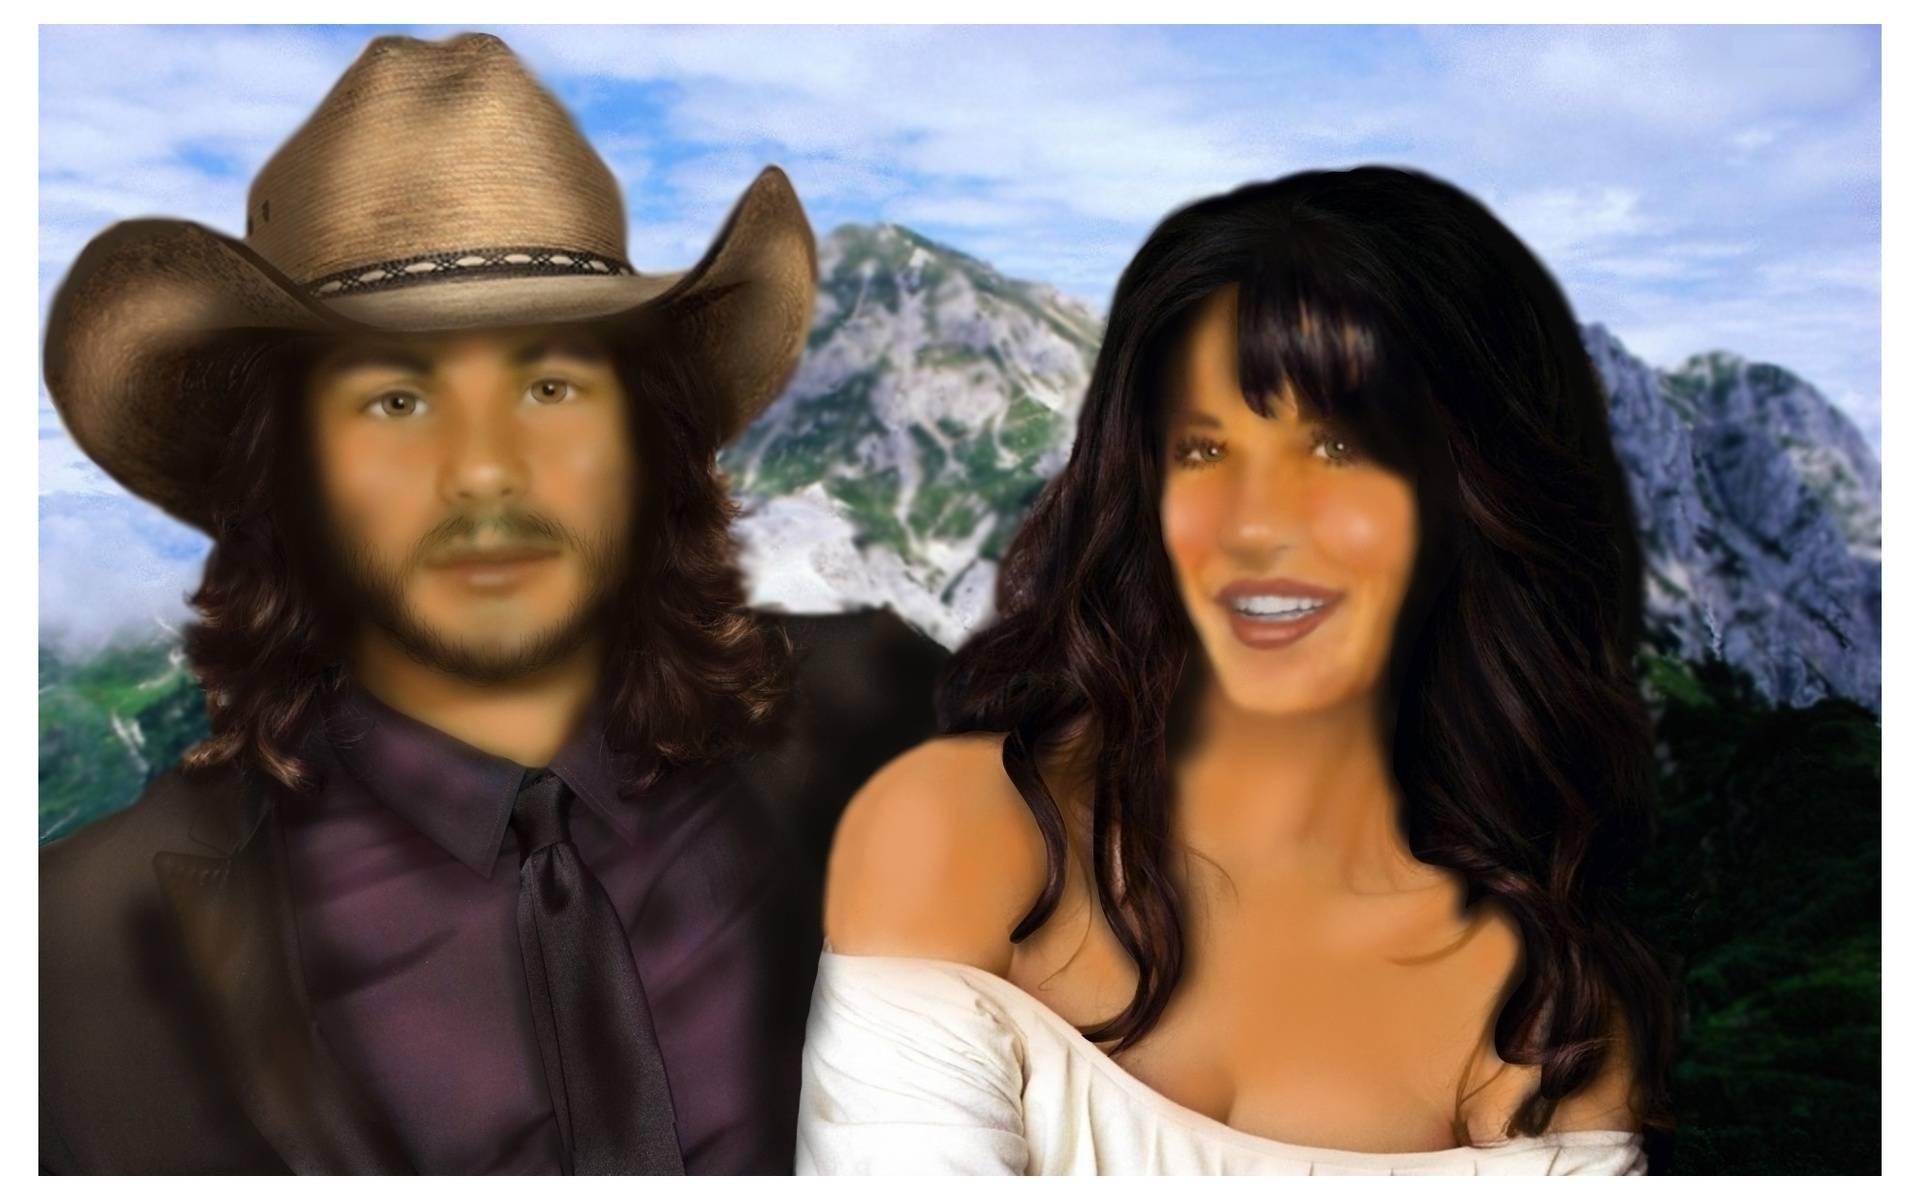 Cow Hip (Cowboy-Hippie) and his Girl